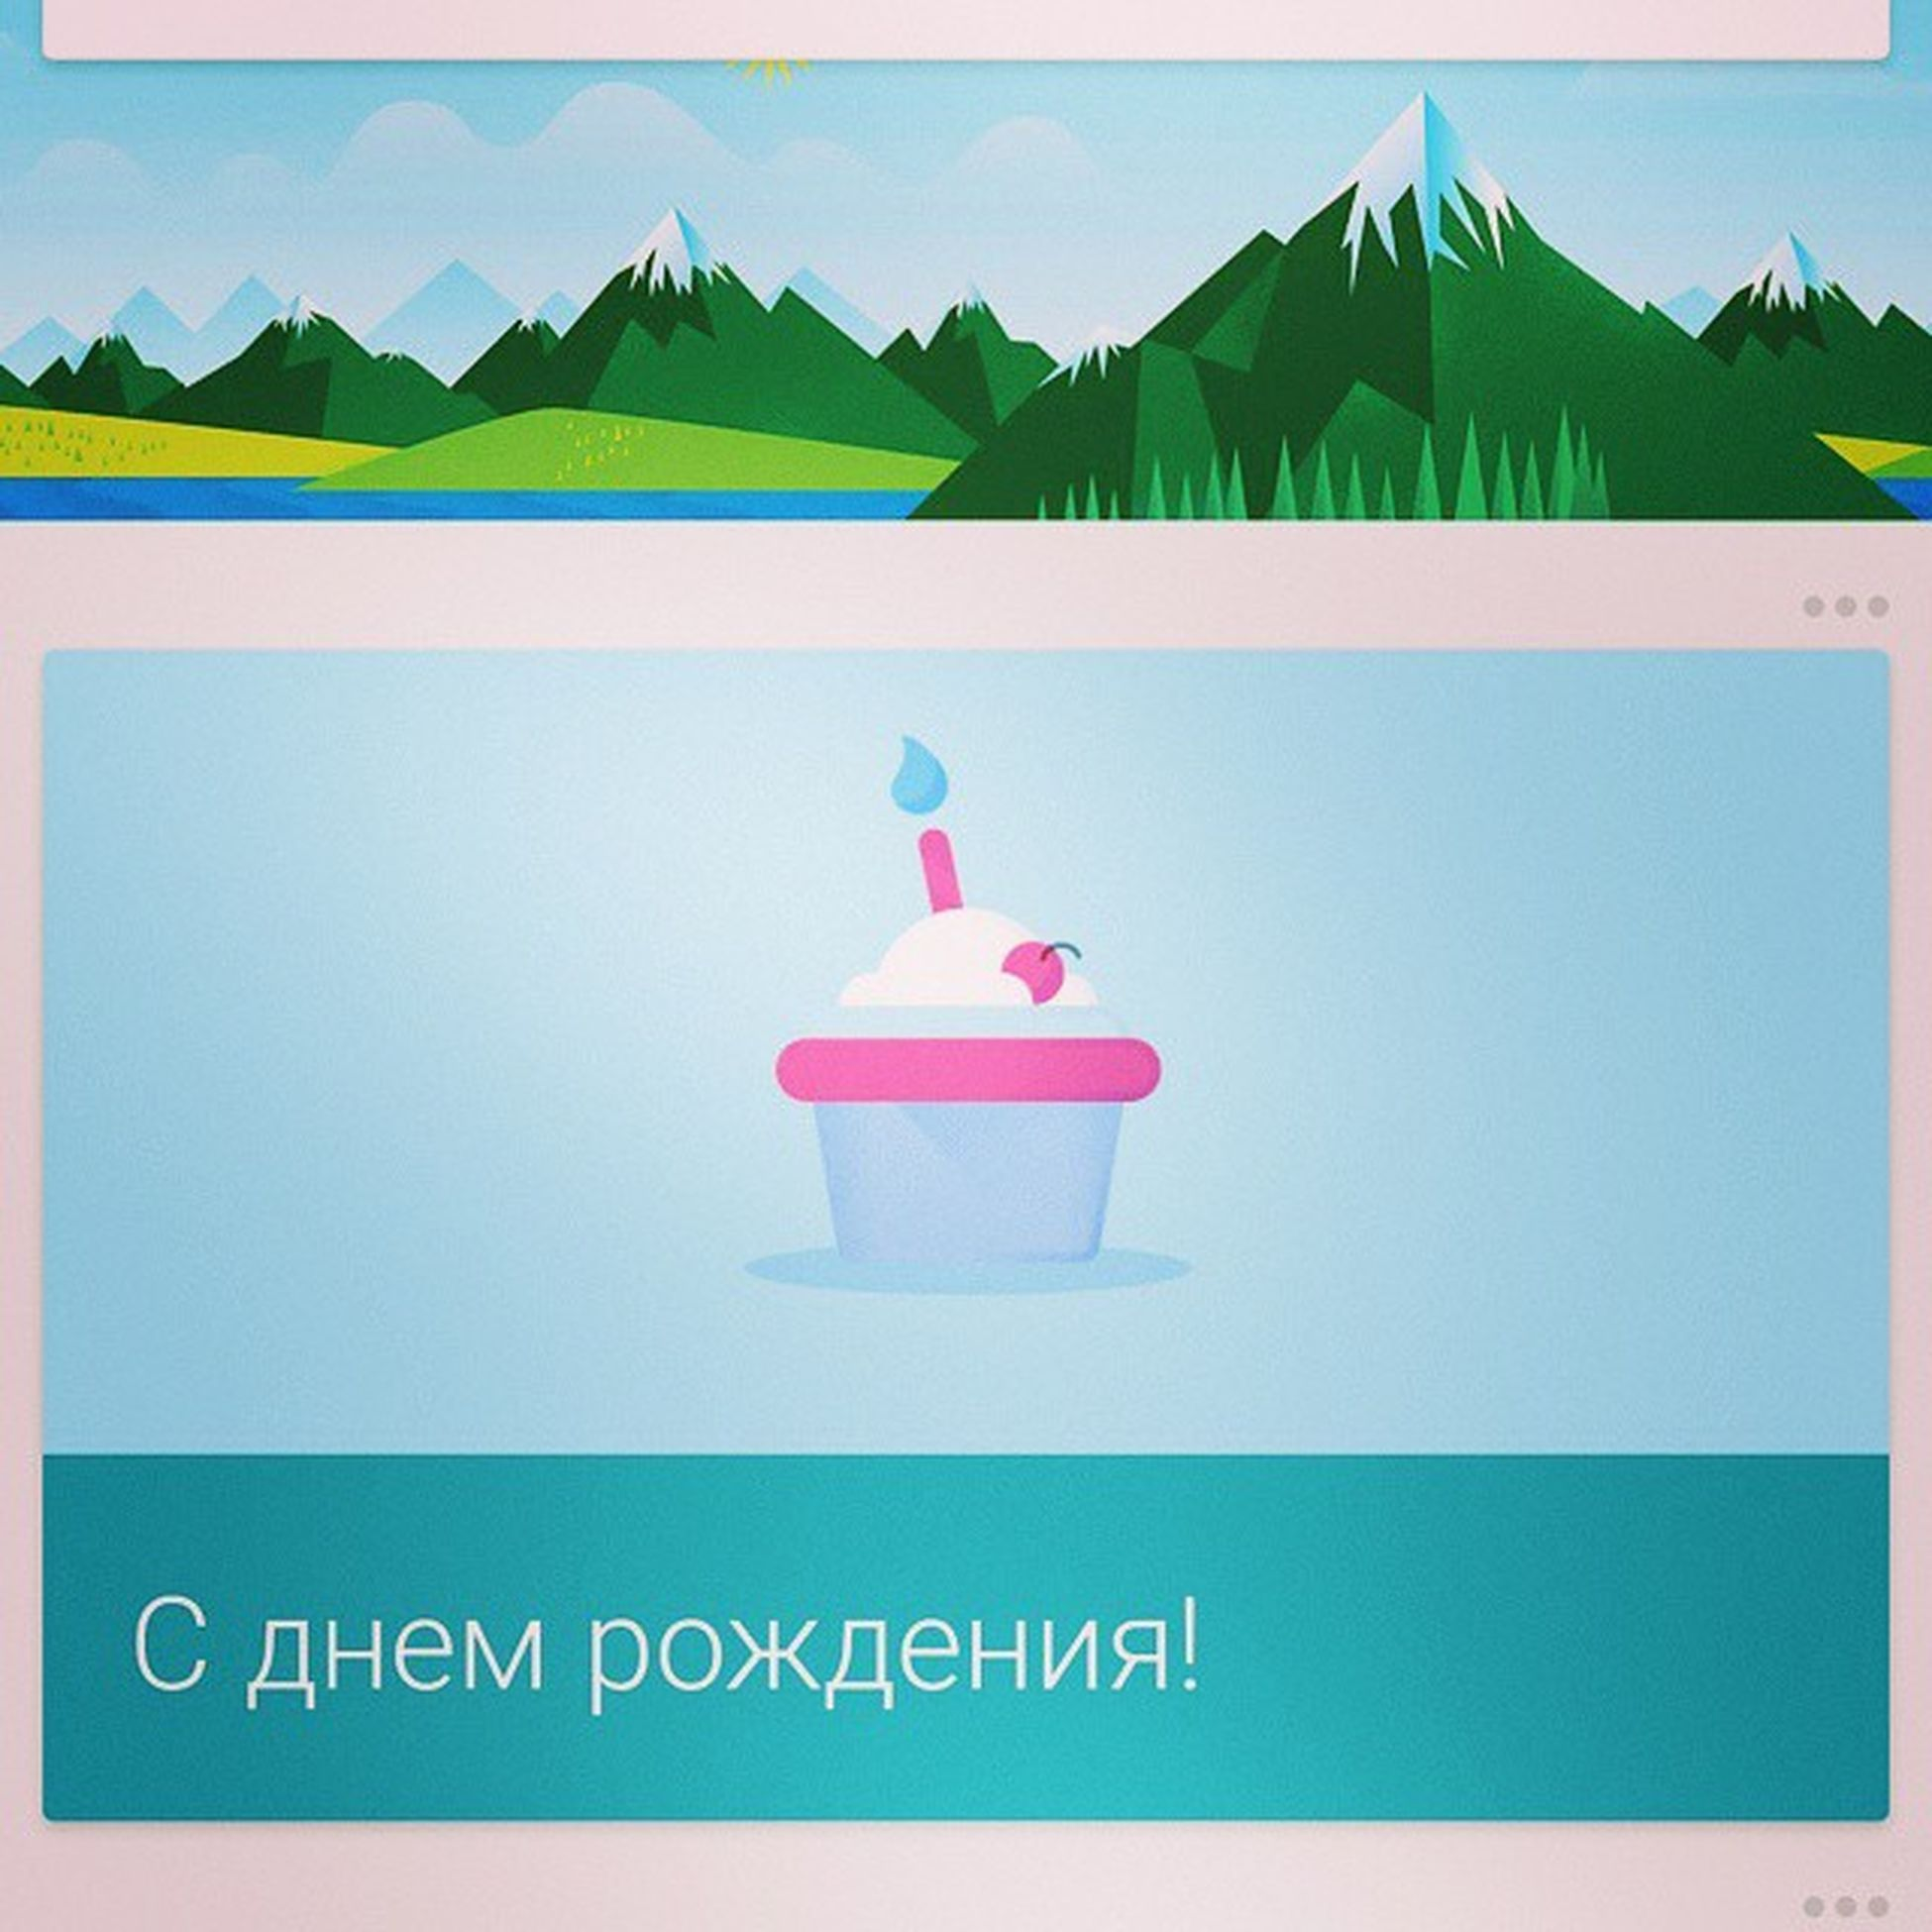 20ноября спасибо гуглпоздравил ???